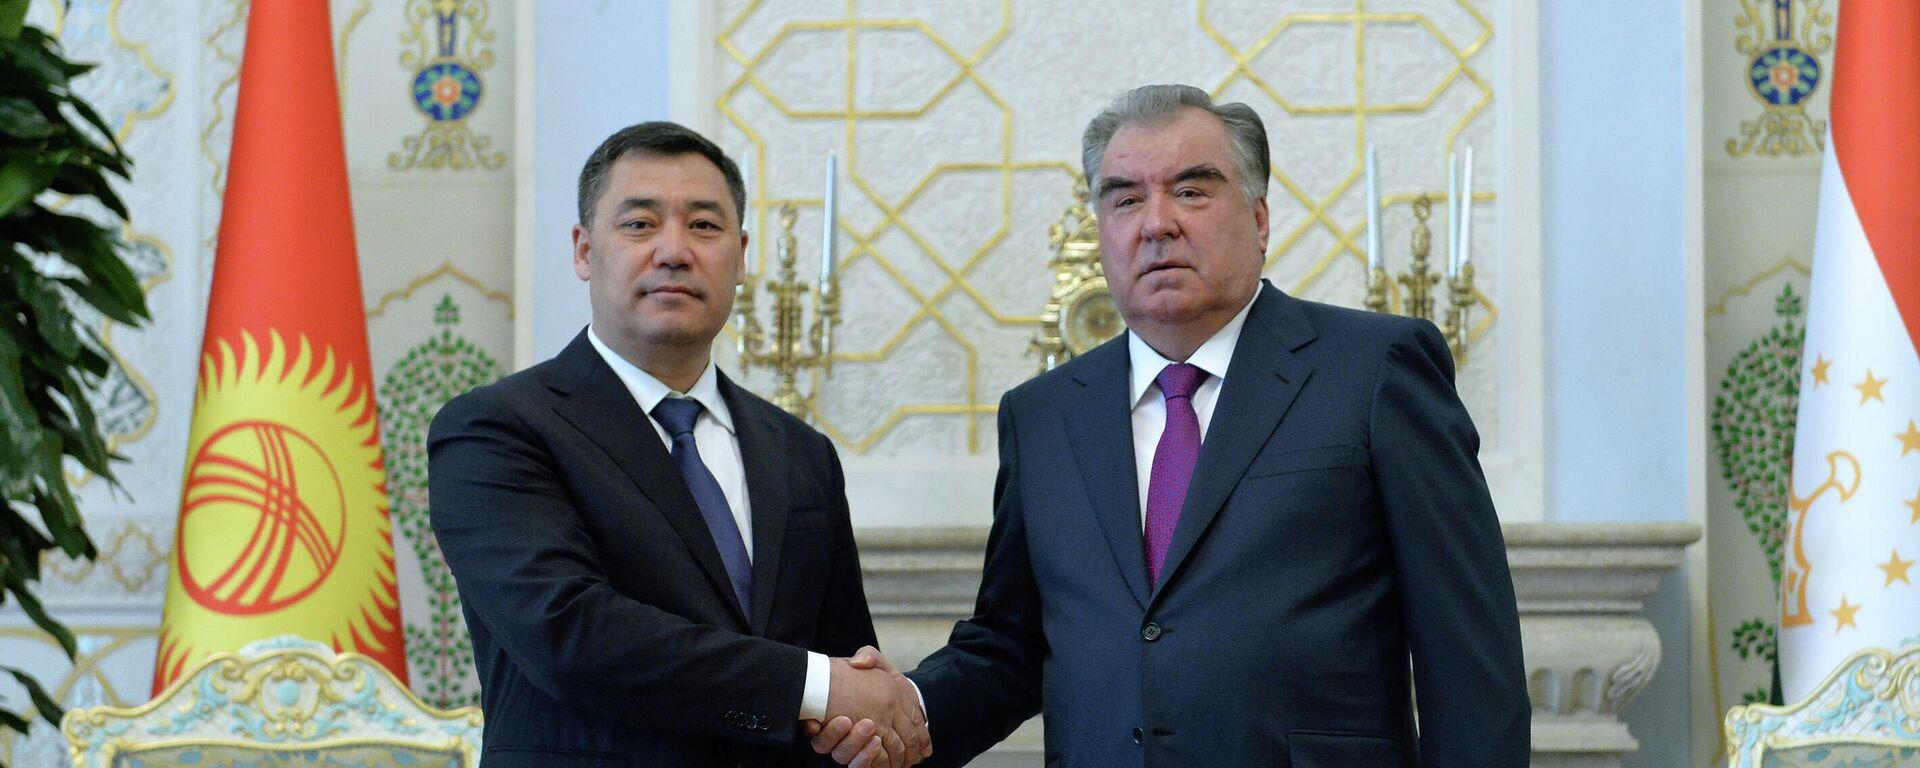 Встреча президента Таджикистана Эмомали Рахмона и президента Кыргызстана Садыра Жапарова - Sputnik Таджикистан, 1920, 29.06.2021